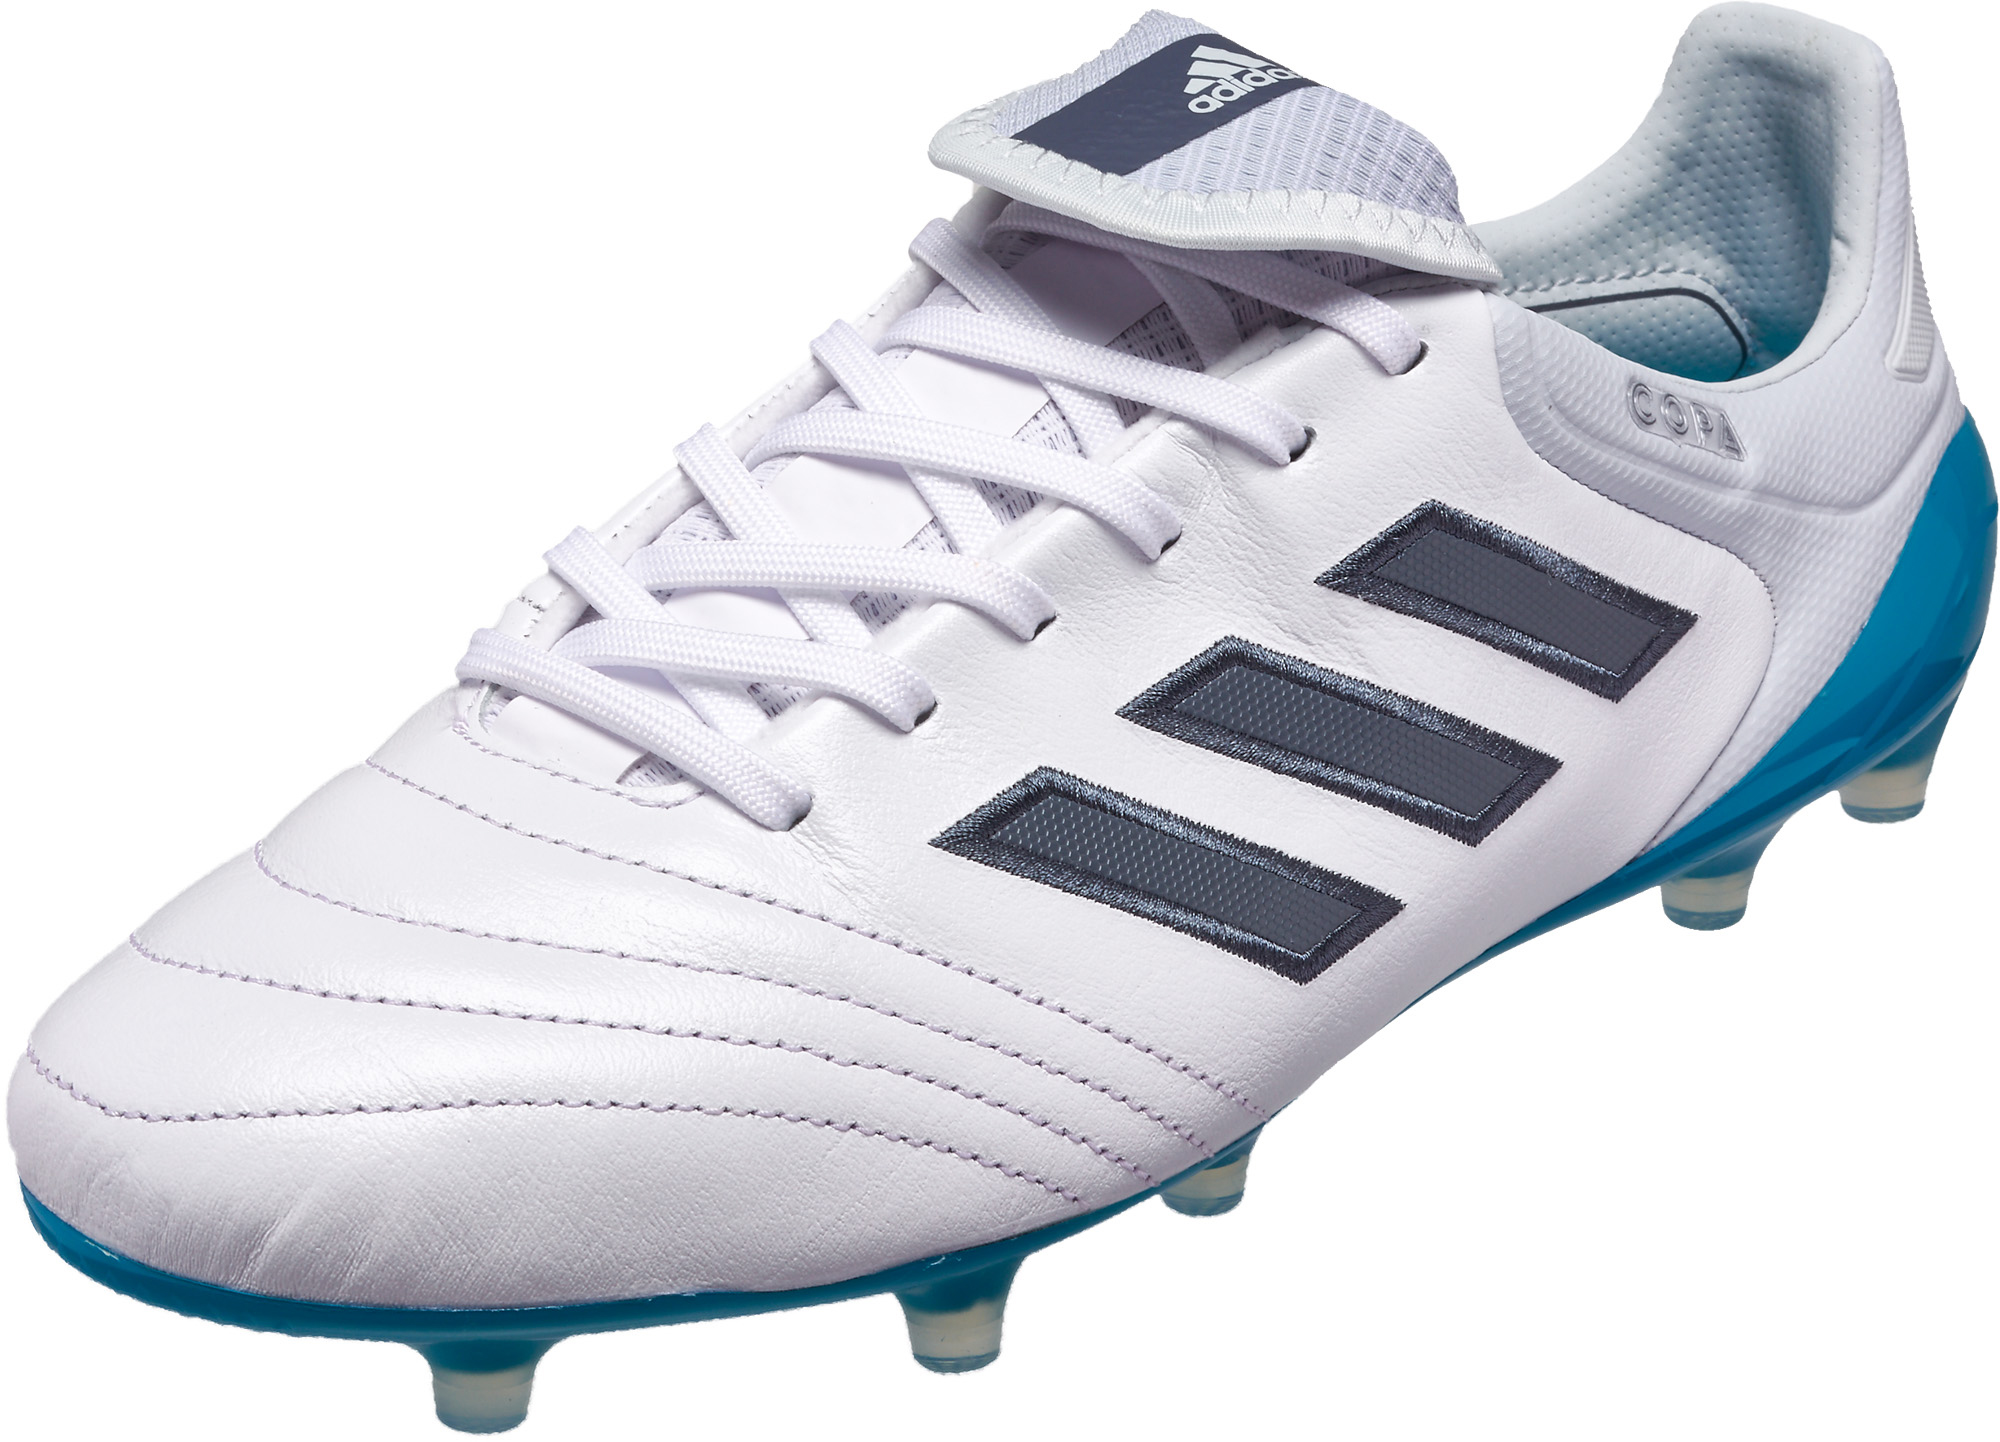 adidas Copa 17.1 FG - adidas Copa Soccer Cleats 00aebc7ad